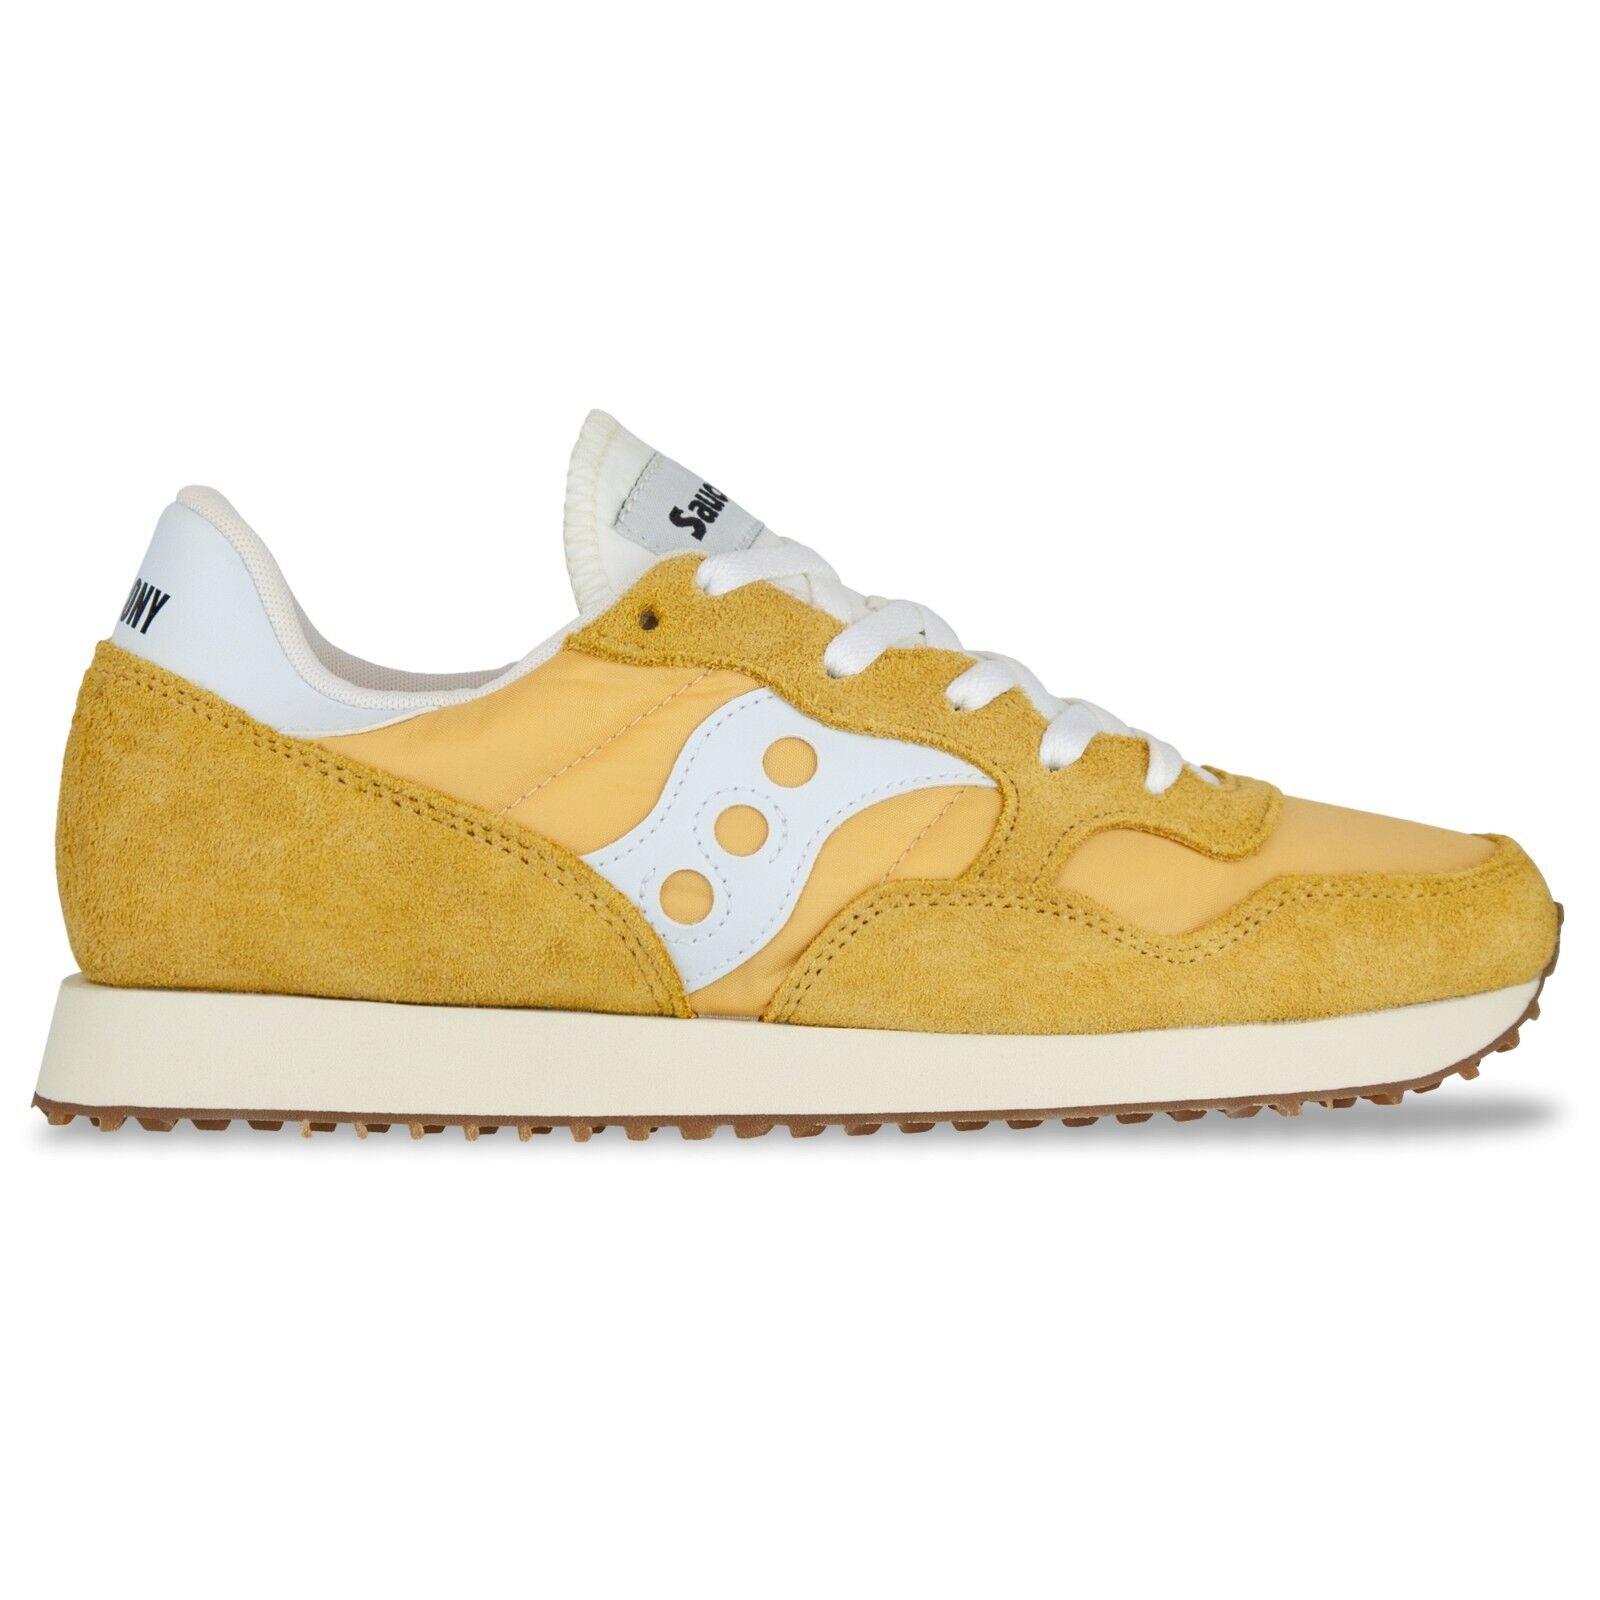 Saucony Originals - Saucony DXN Vintage Weiß, Trainers - Yellow, Pink, Weiß, Vintage Aqua 5d8a53